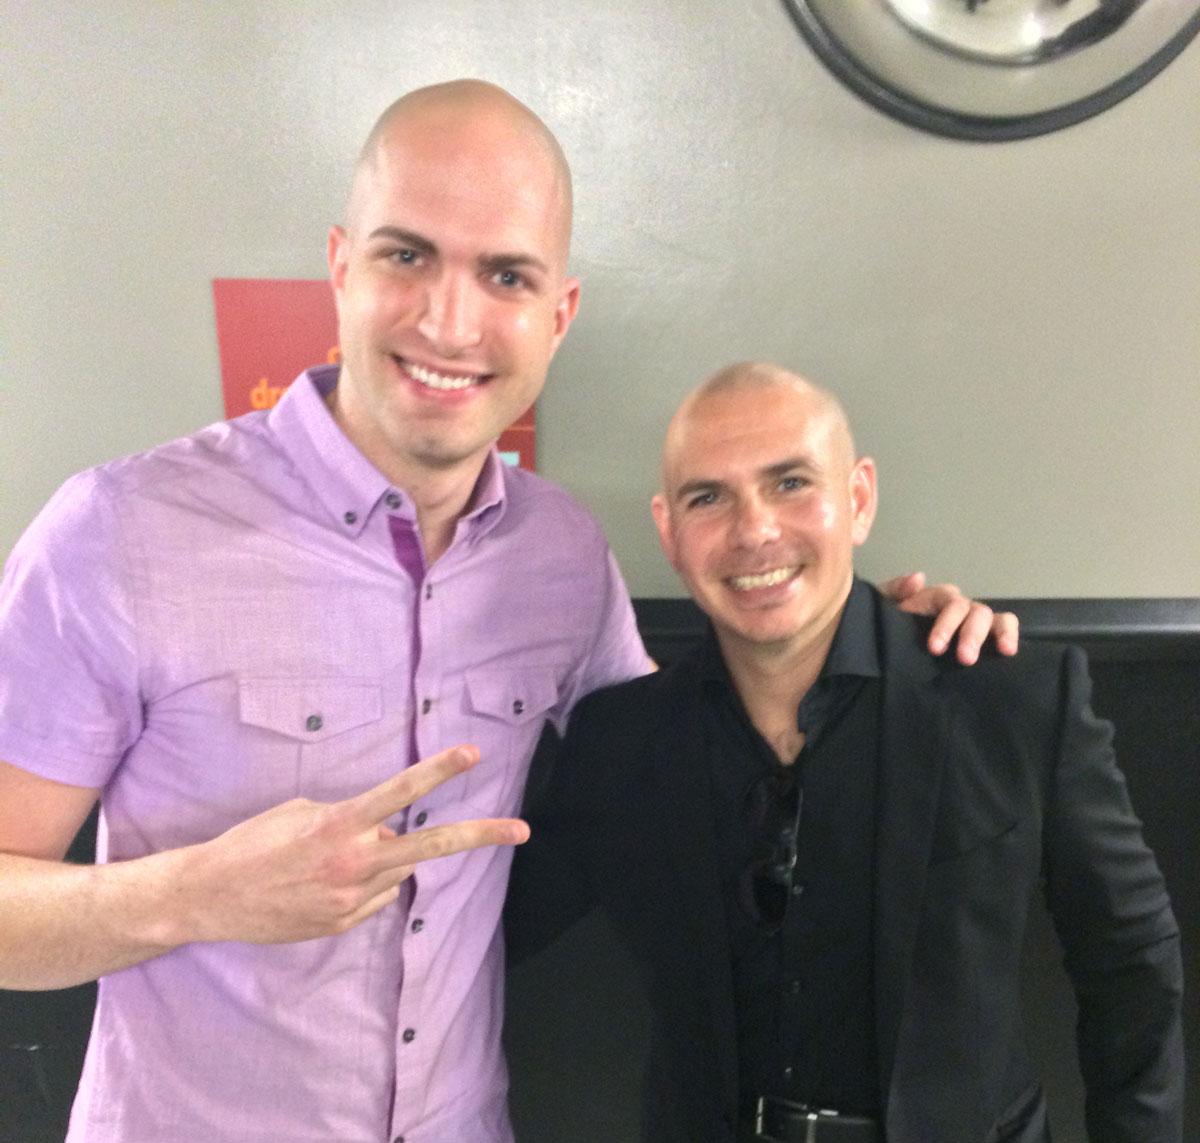 with Pitbull